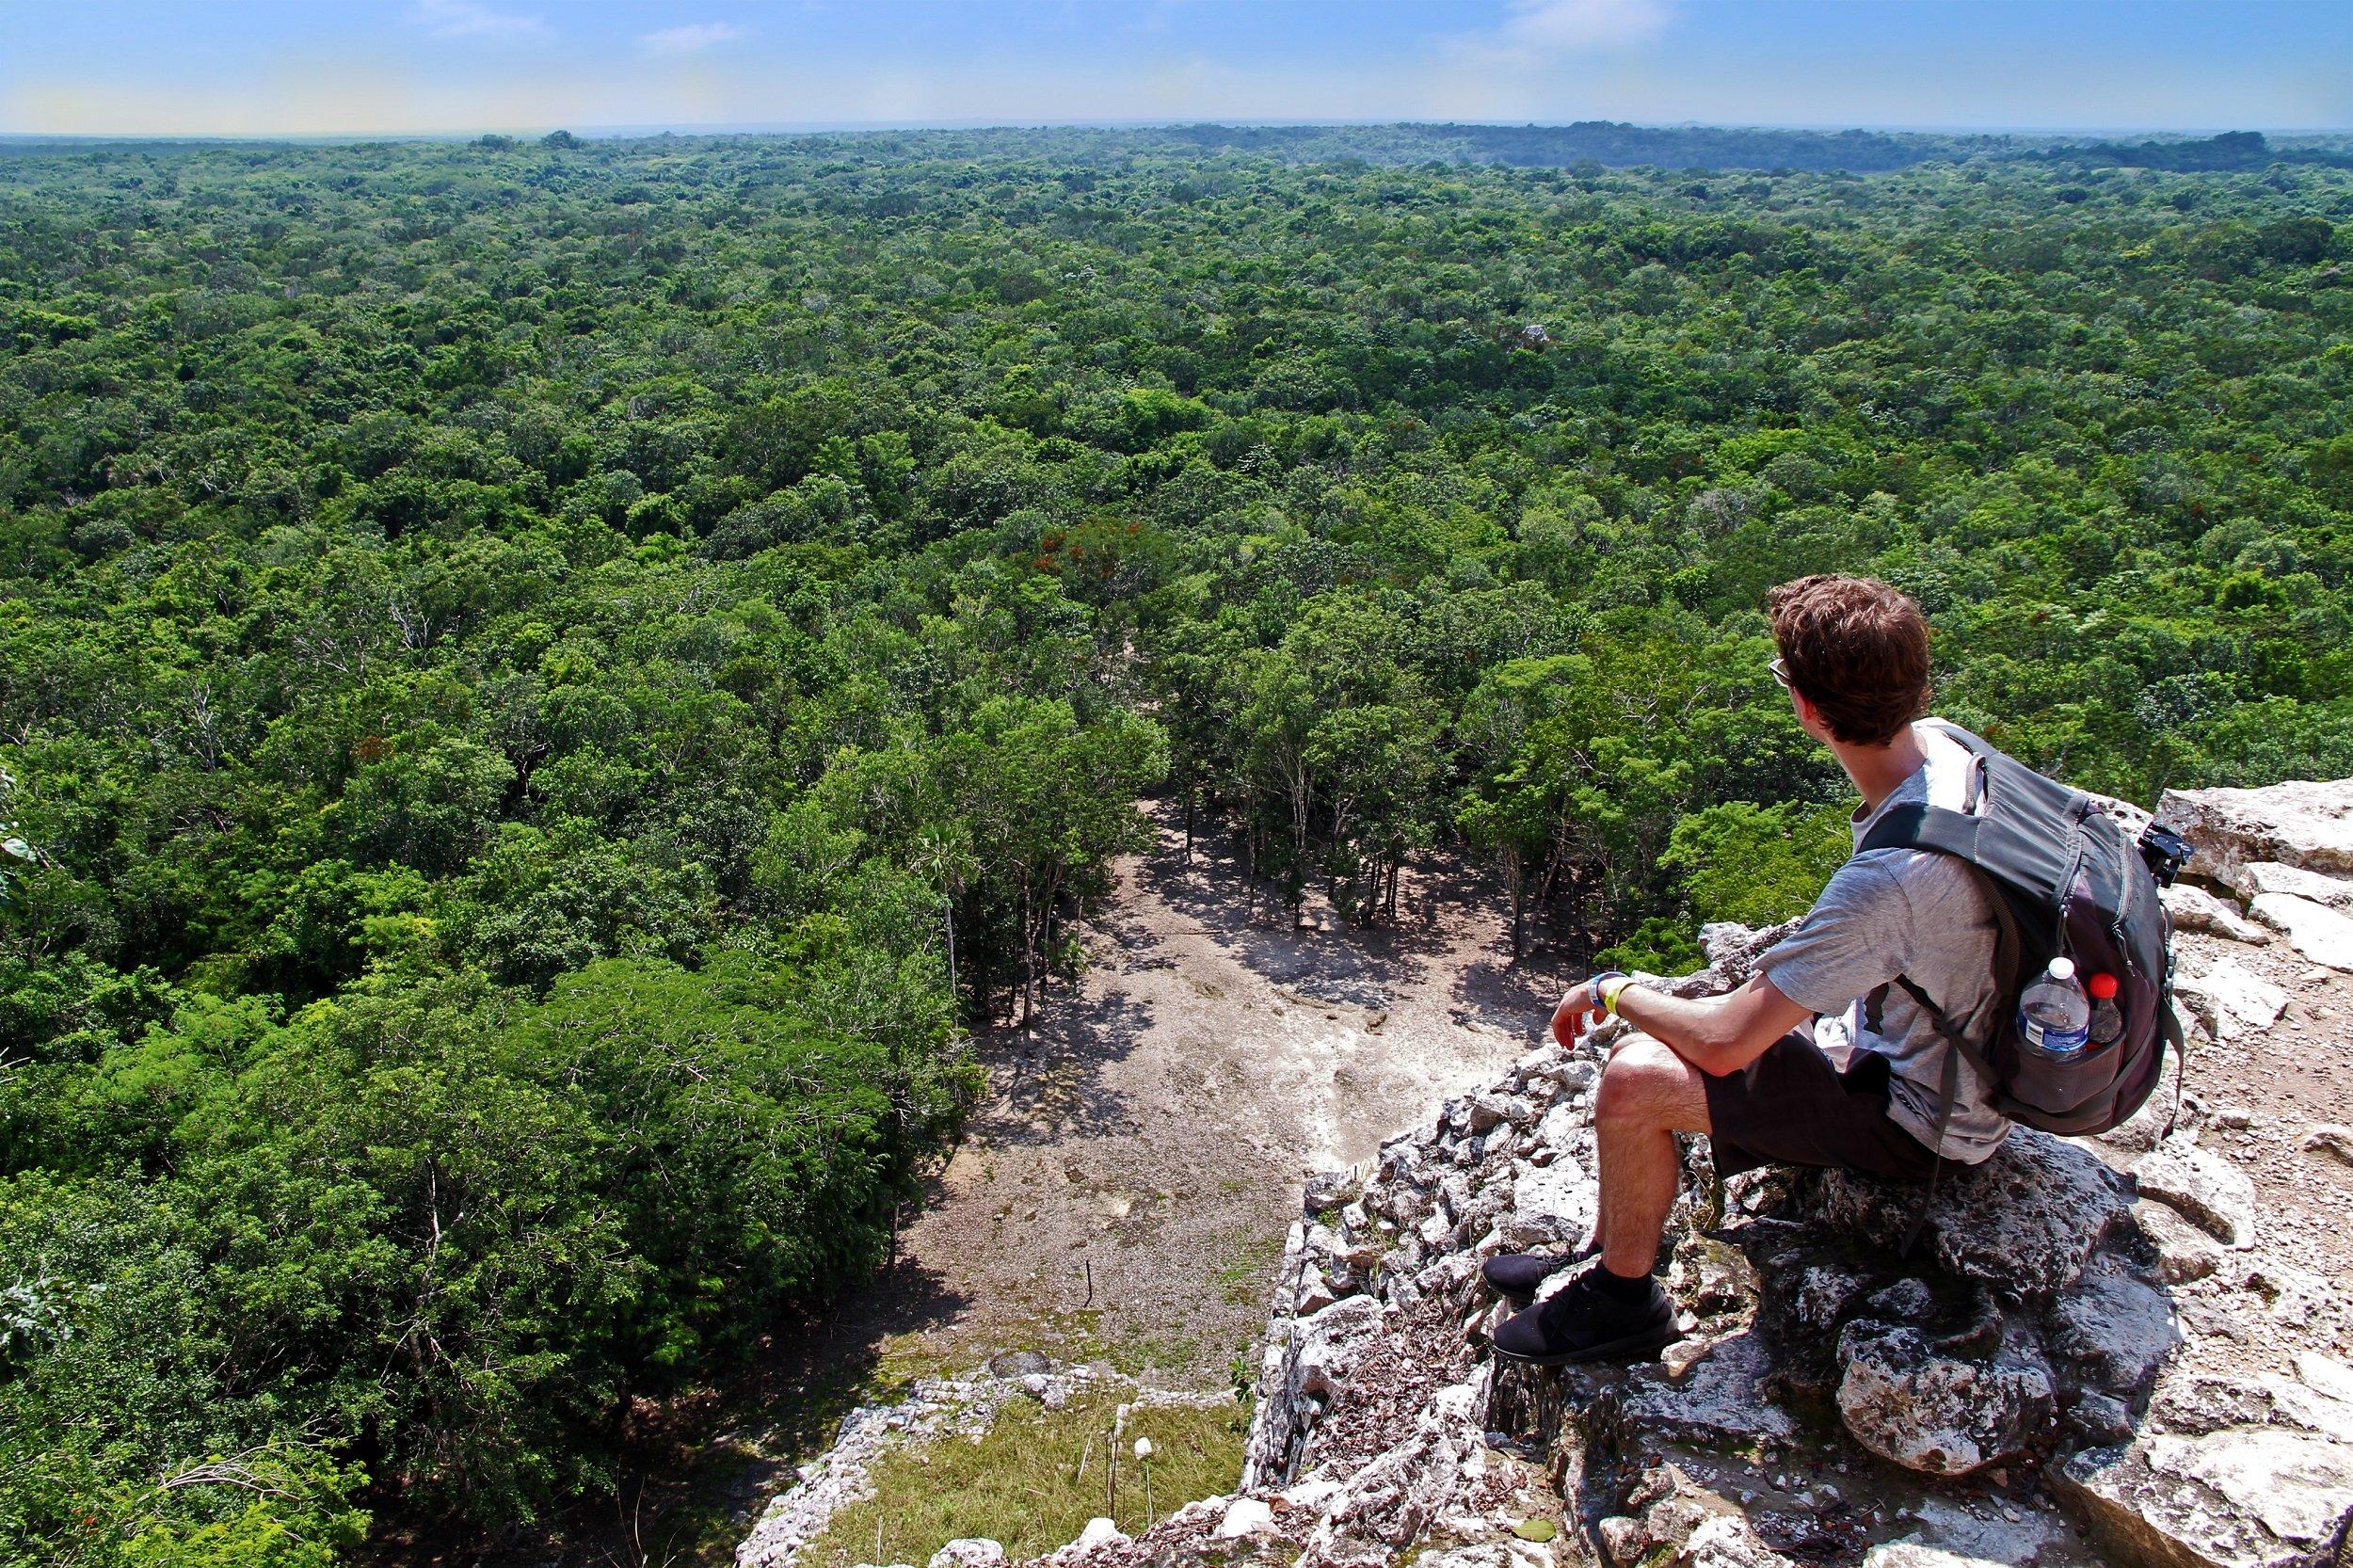 Mayan Culture, Coba & Punta Laguna Tour From The Riviera Maya